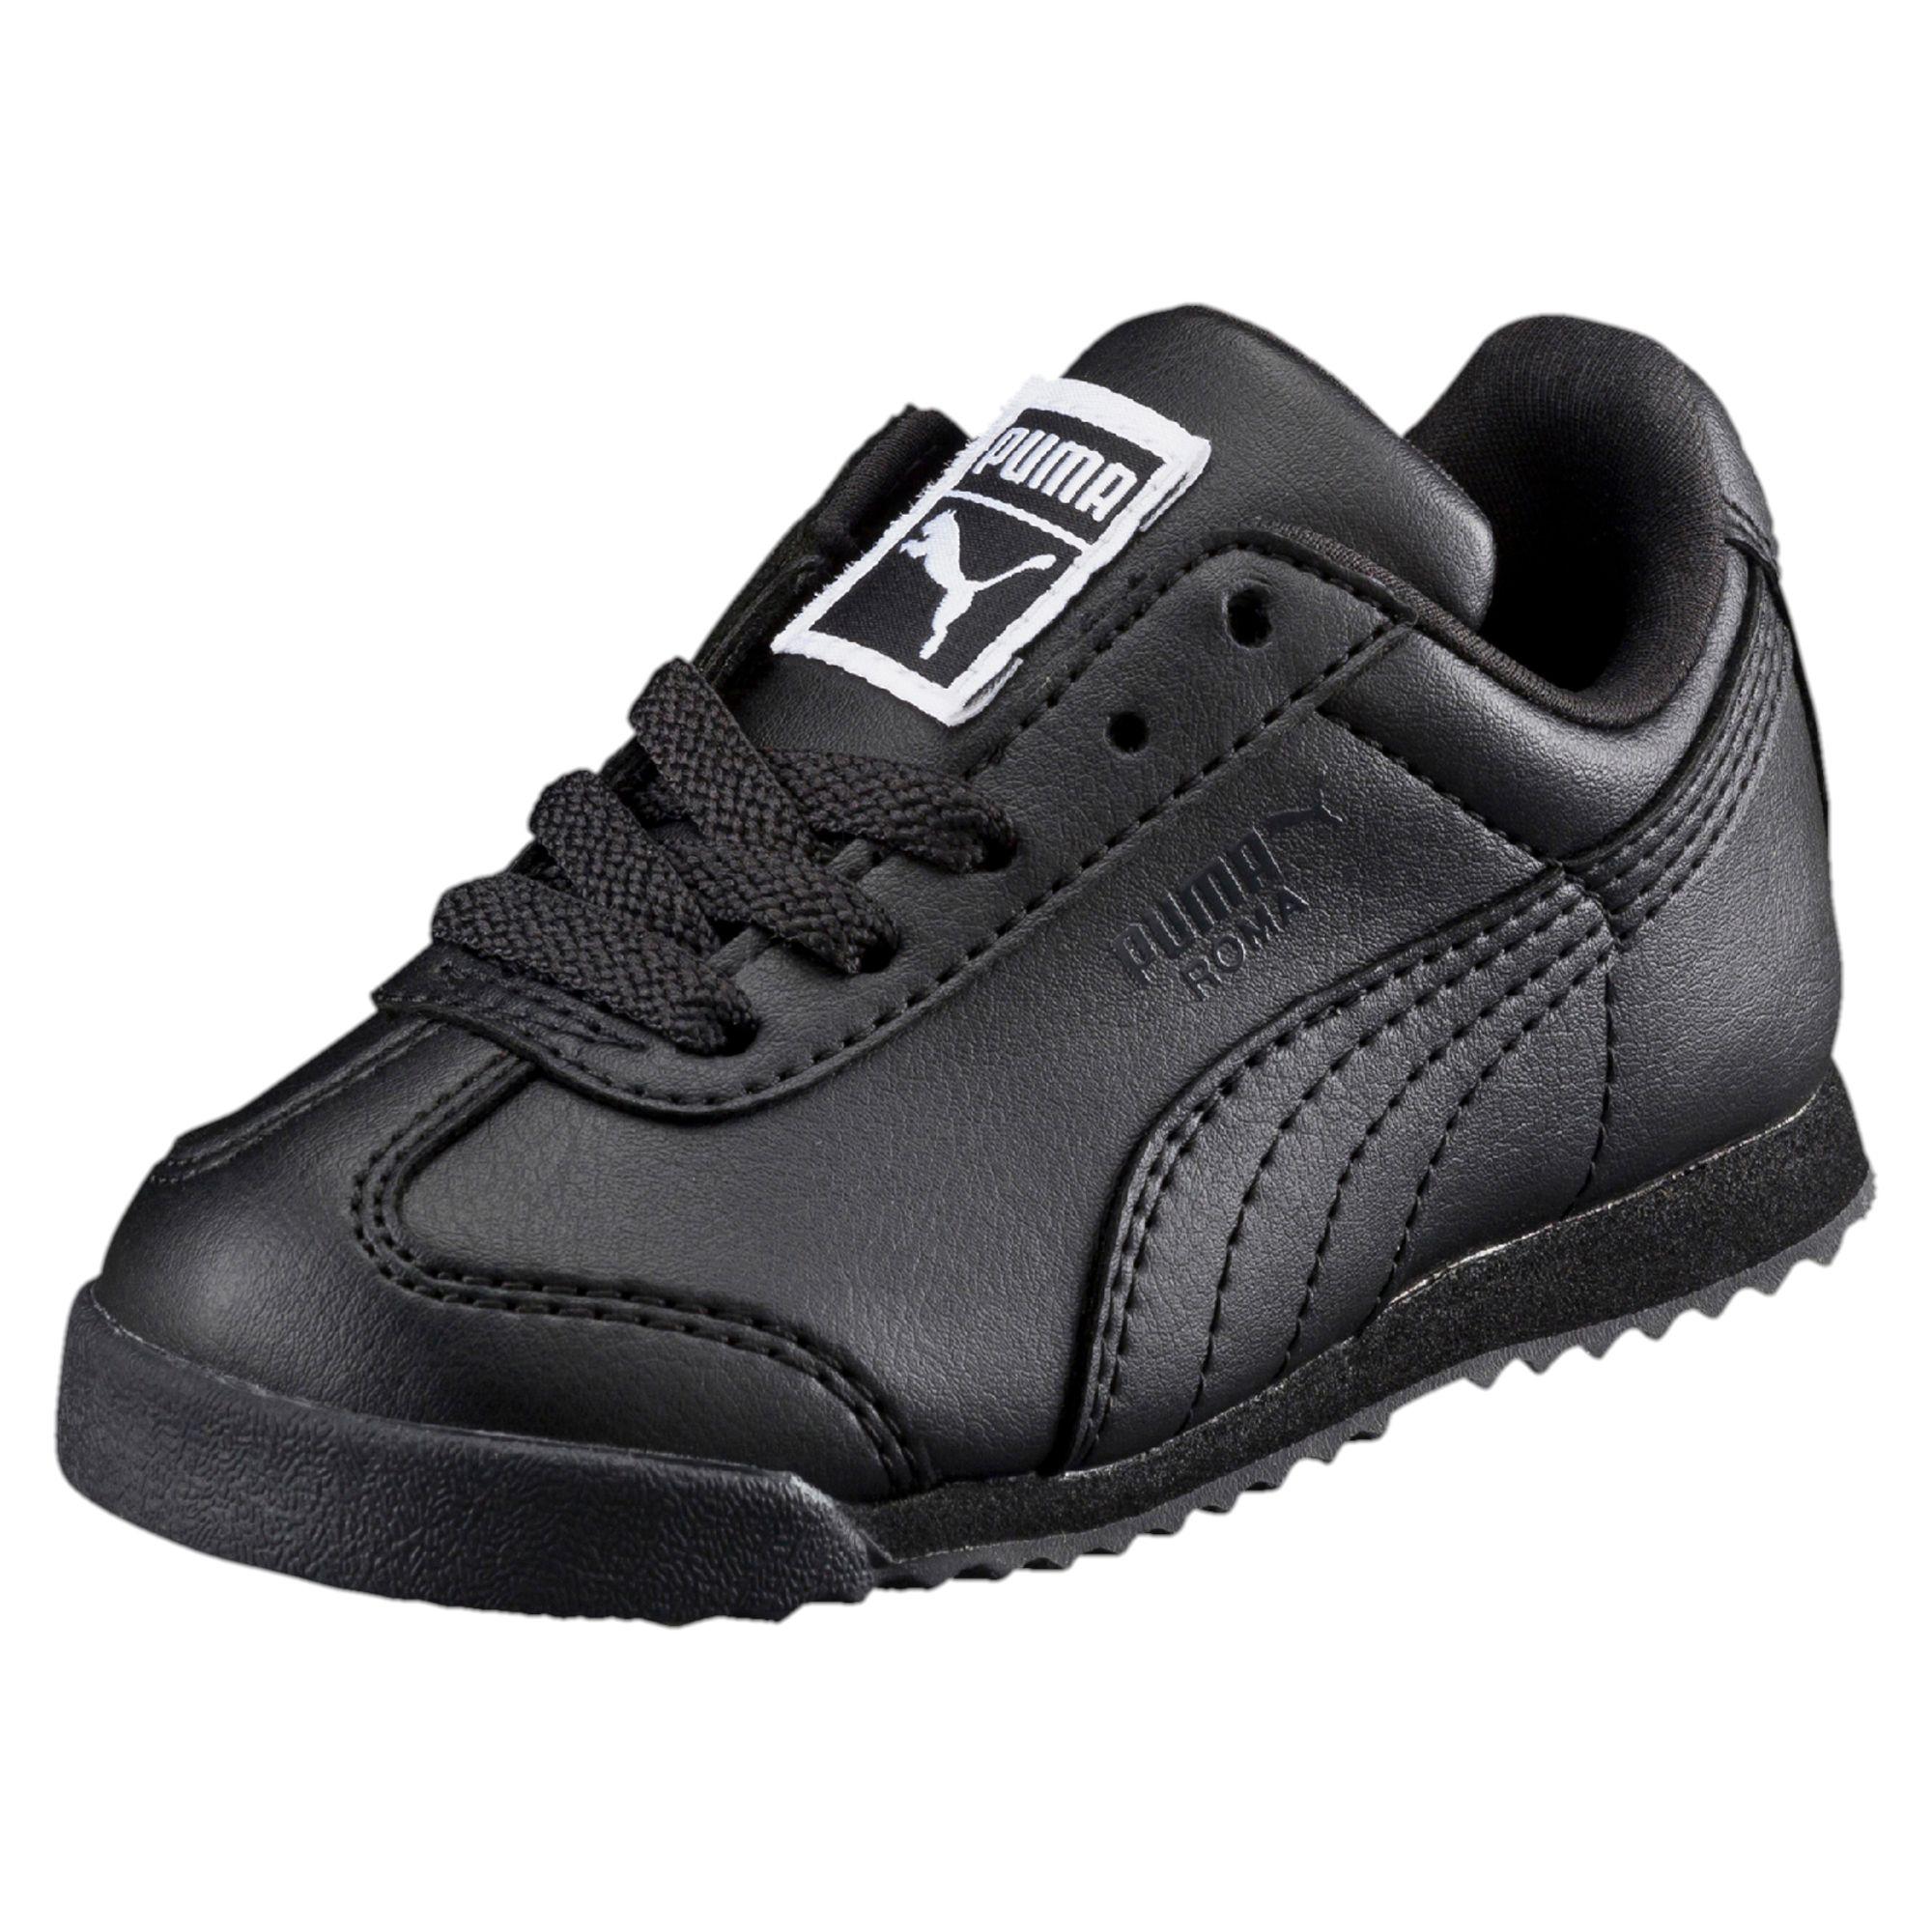 PUMA Roma Basic Kids Sneakers EBay